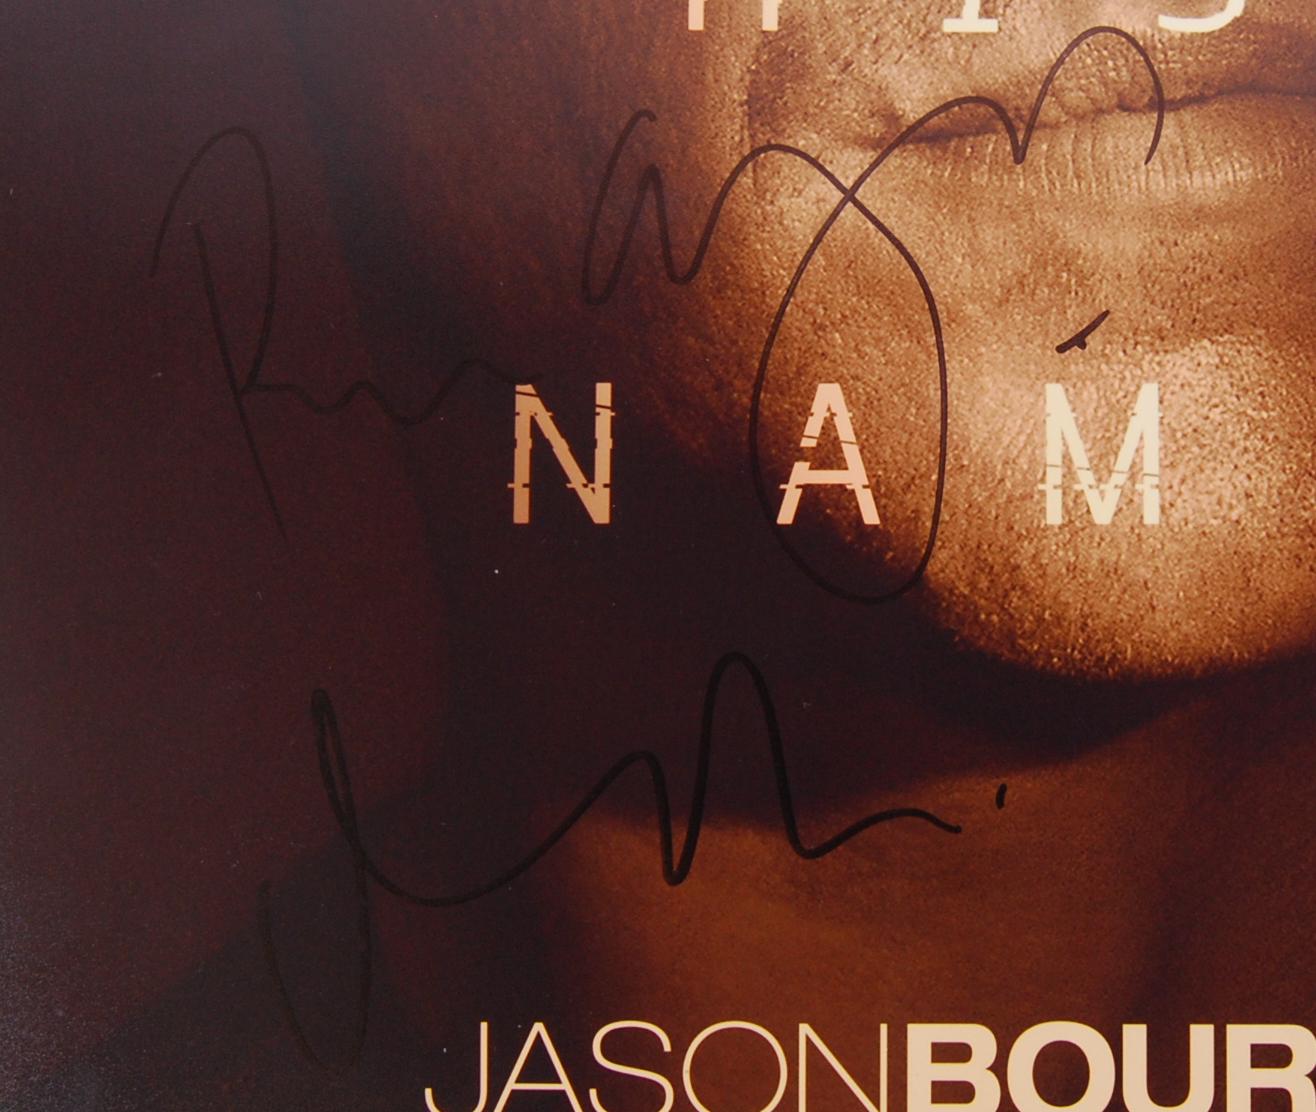 JASON BOURNE - MATT DAMON & DIRECTOR - SIGNED MOVI - Image 4 of 4